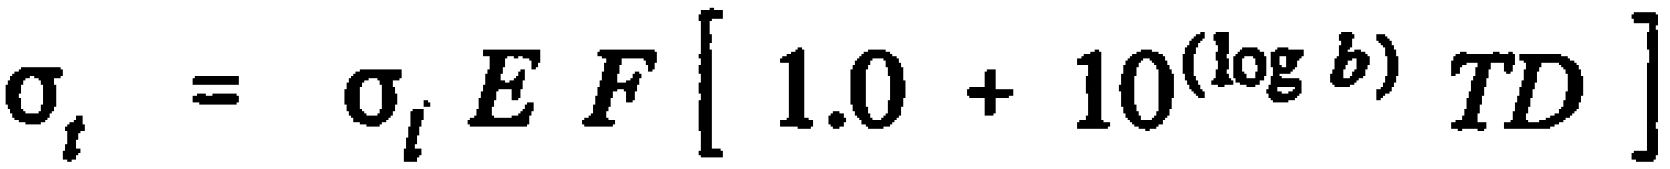 AASHTO Rigid Pavement Design Spreadsheet - Mid Slab Tensile Stress Equation